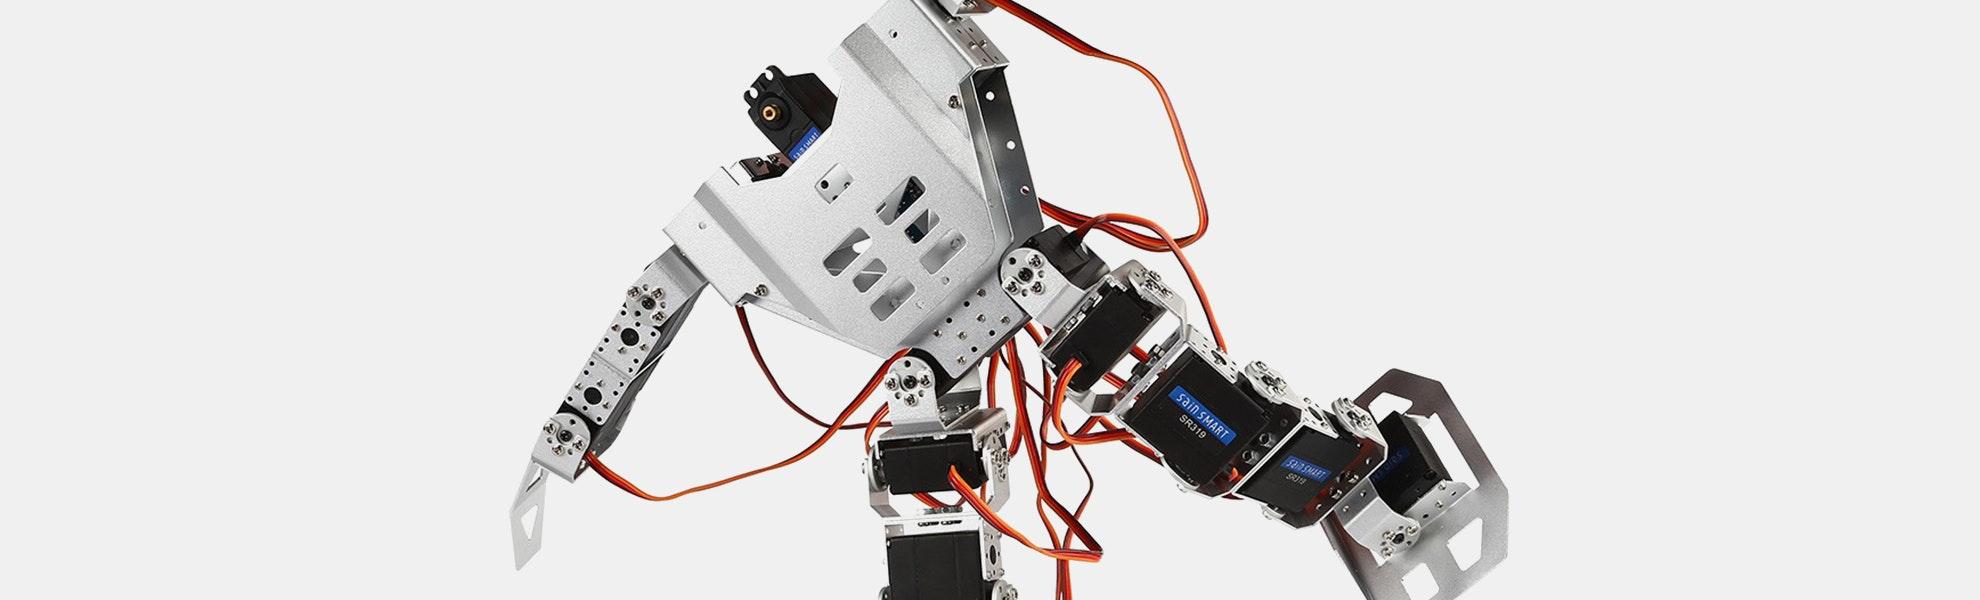 17DOF Biped Robotics Humanoid Robot Bundle